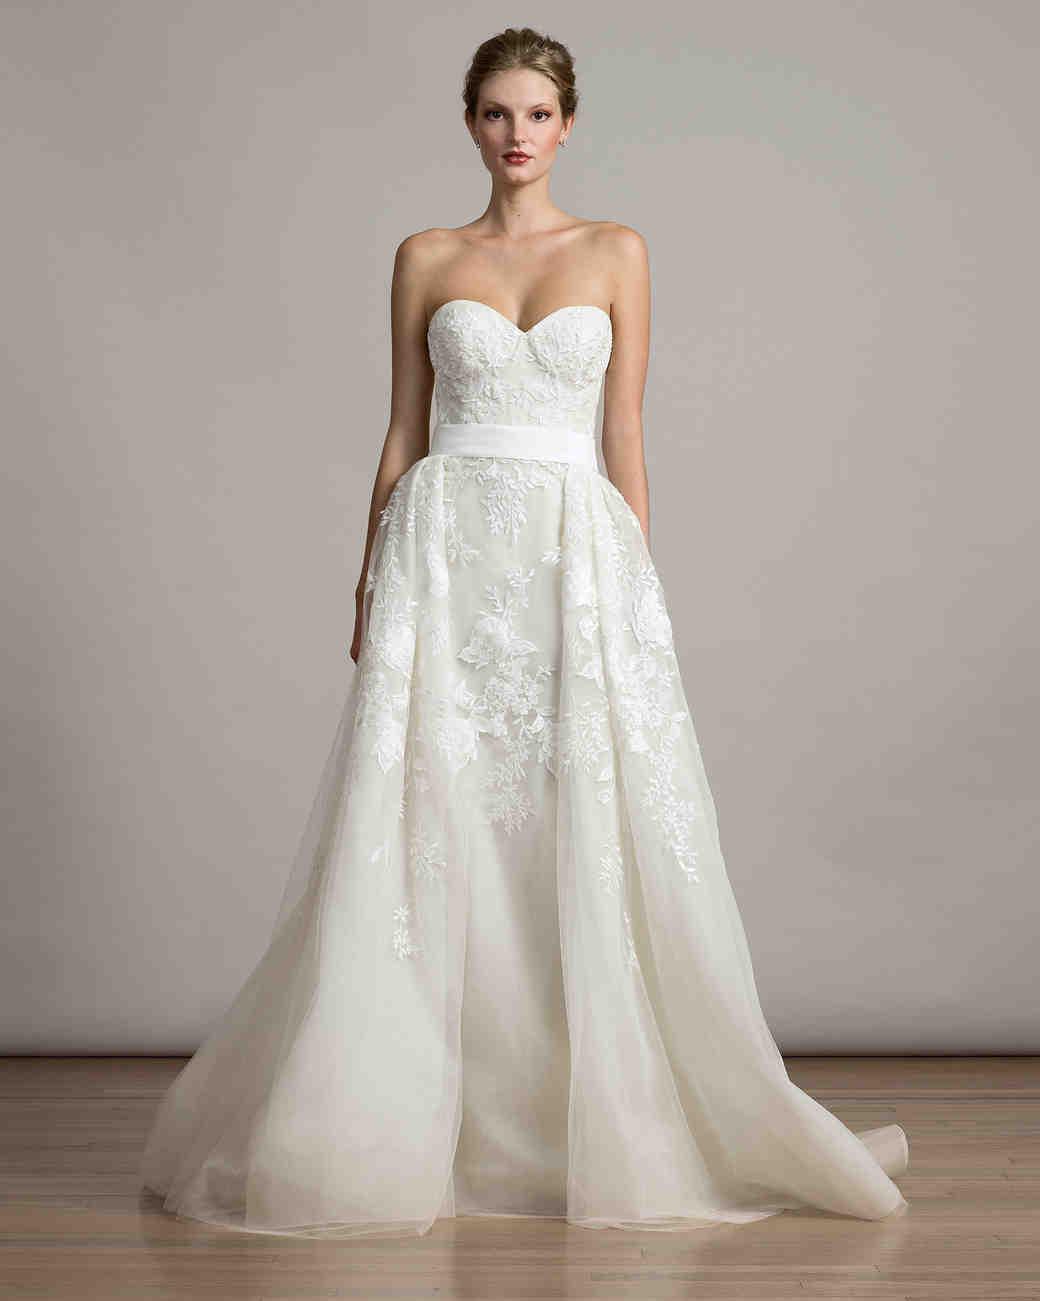 Vows Wedding Dresses 17 Cool Liancarlo Fall Wedding Dress